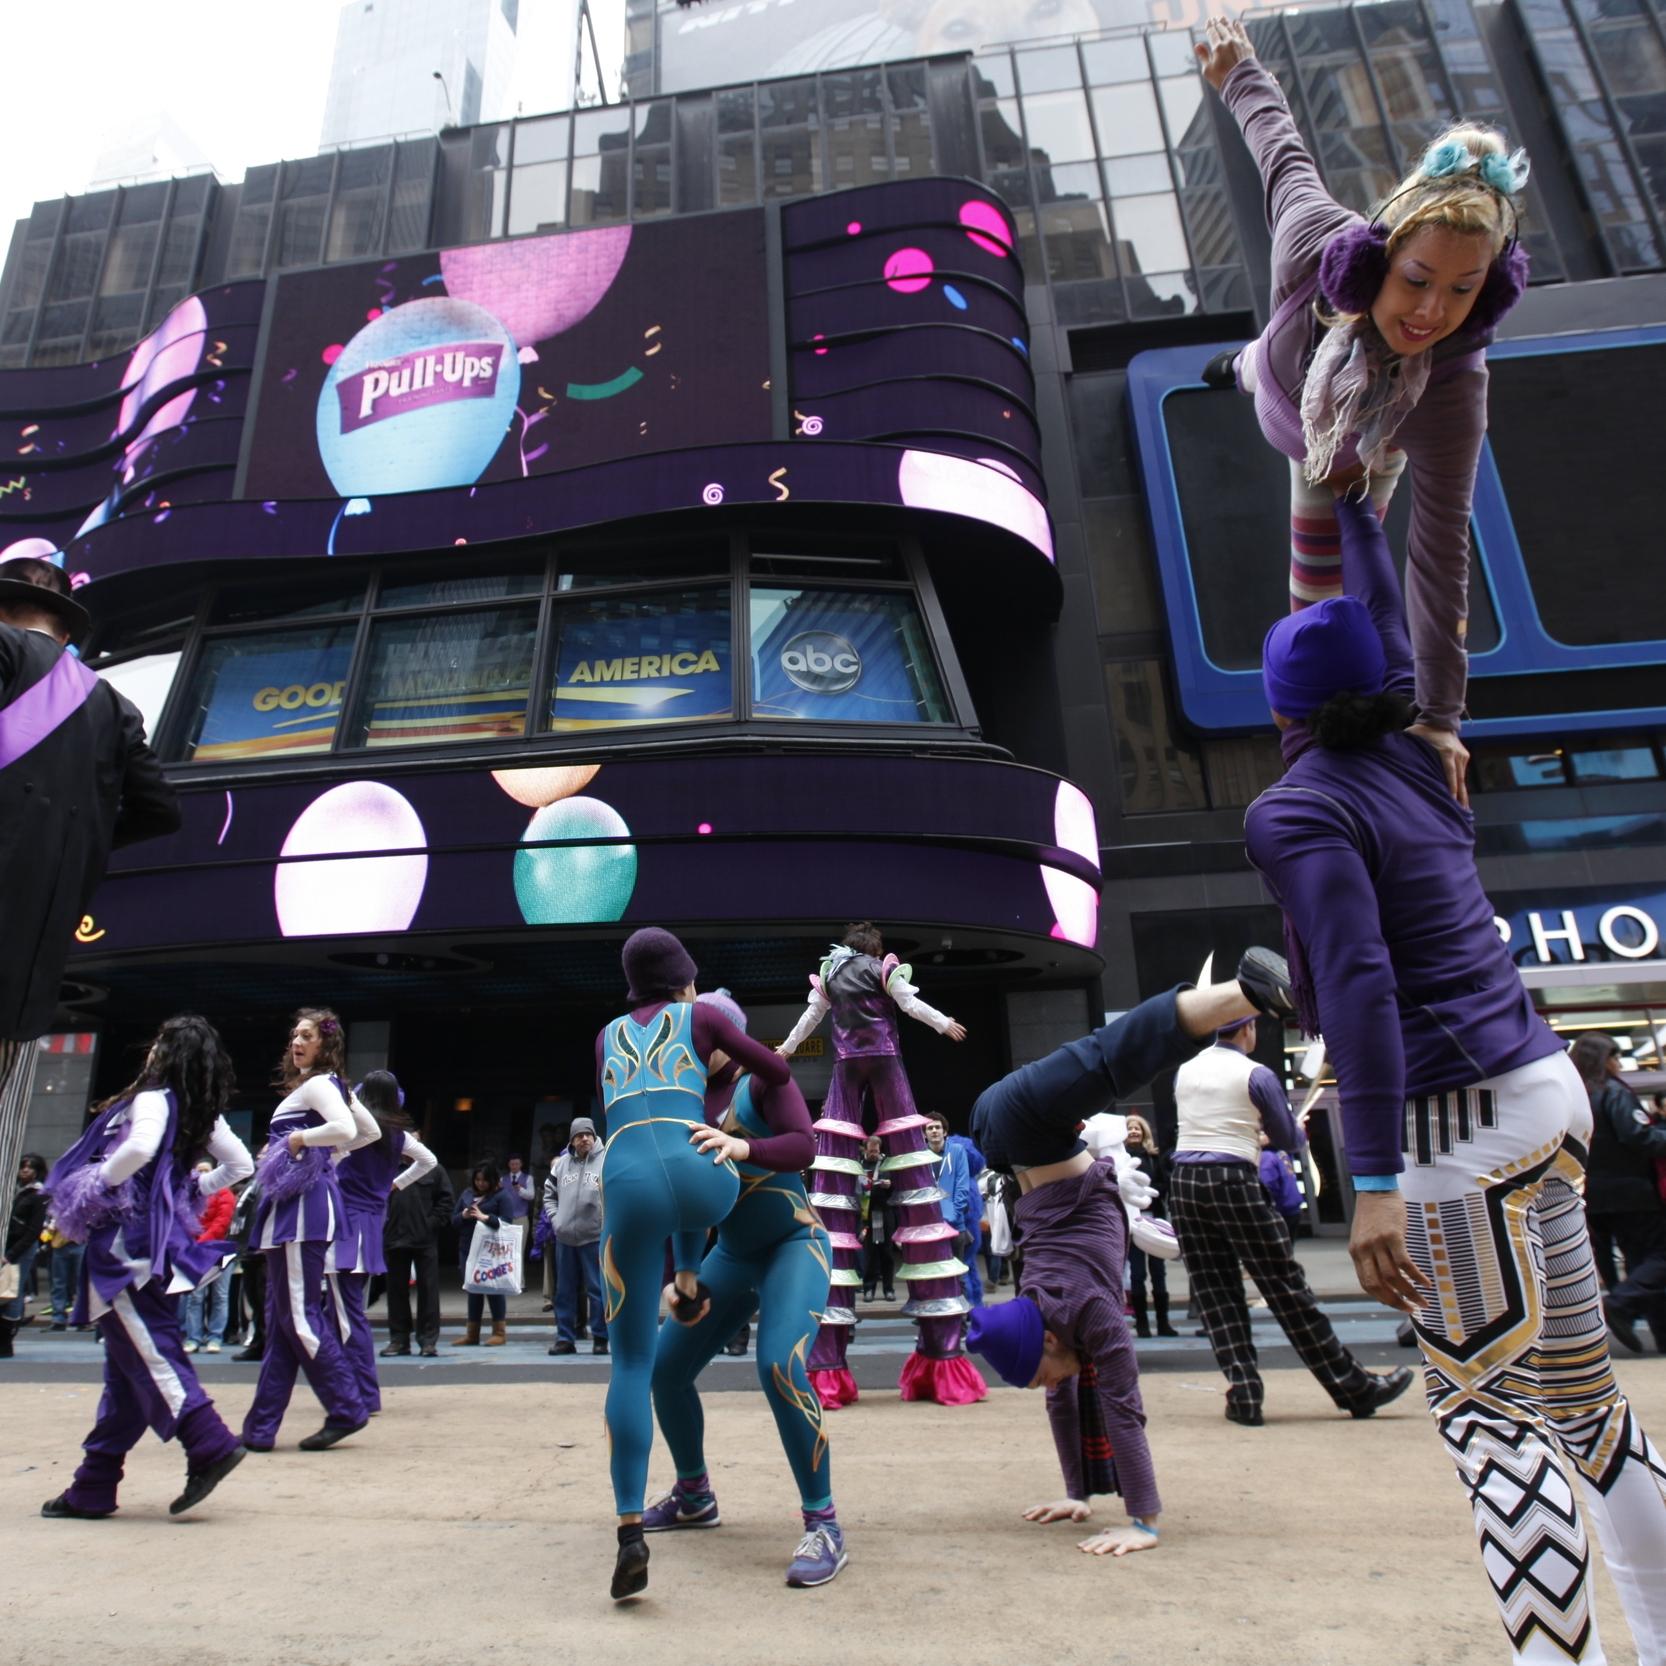 Billboard_Balloons.jpg